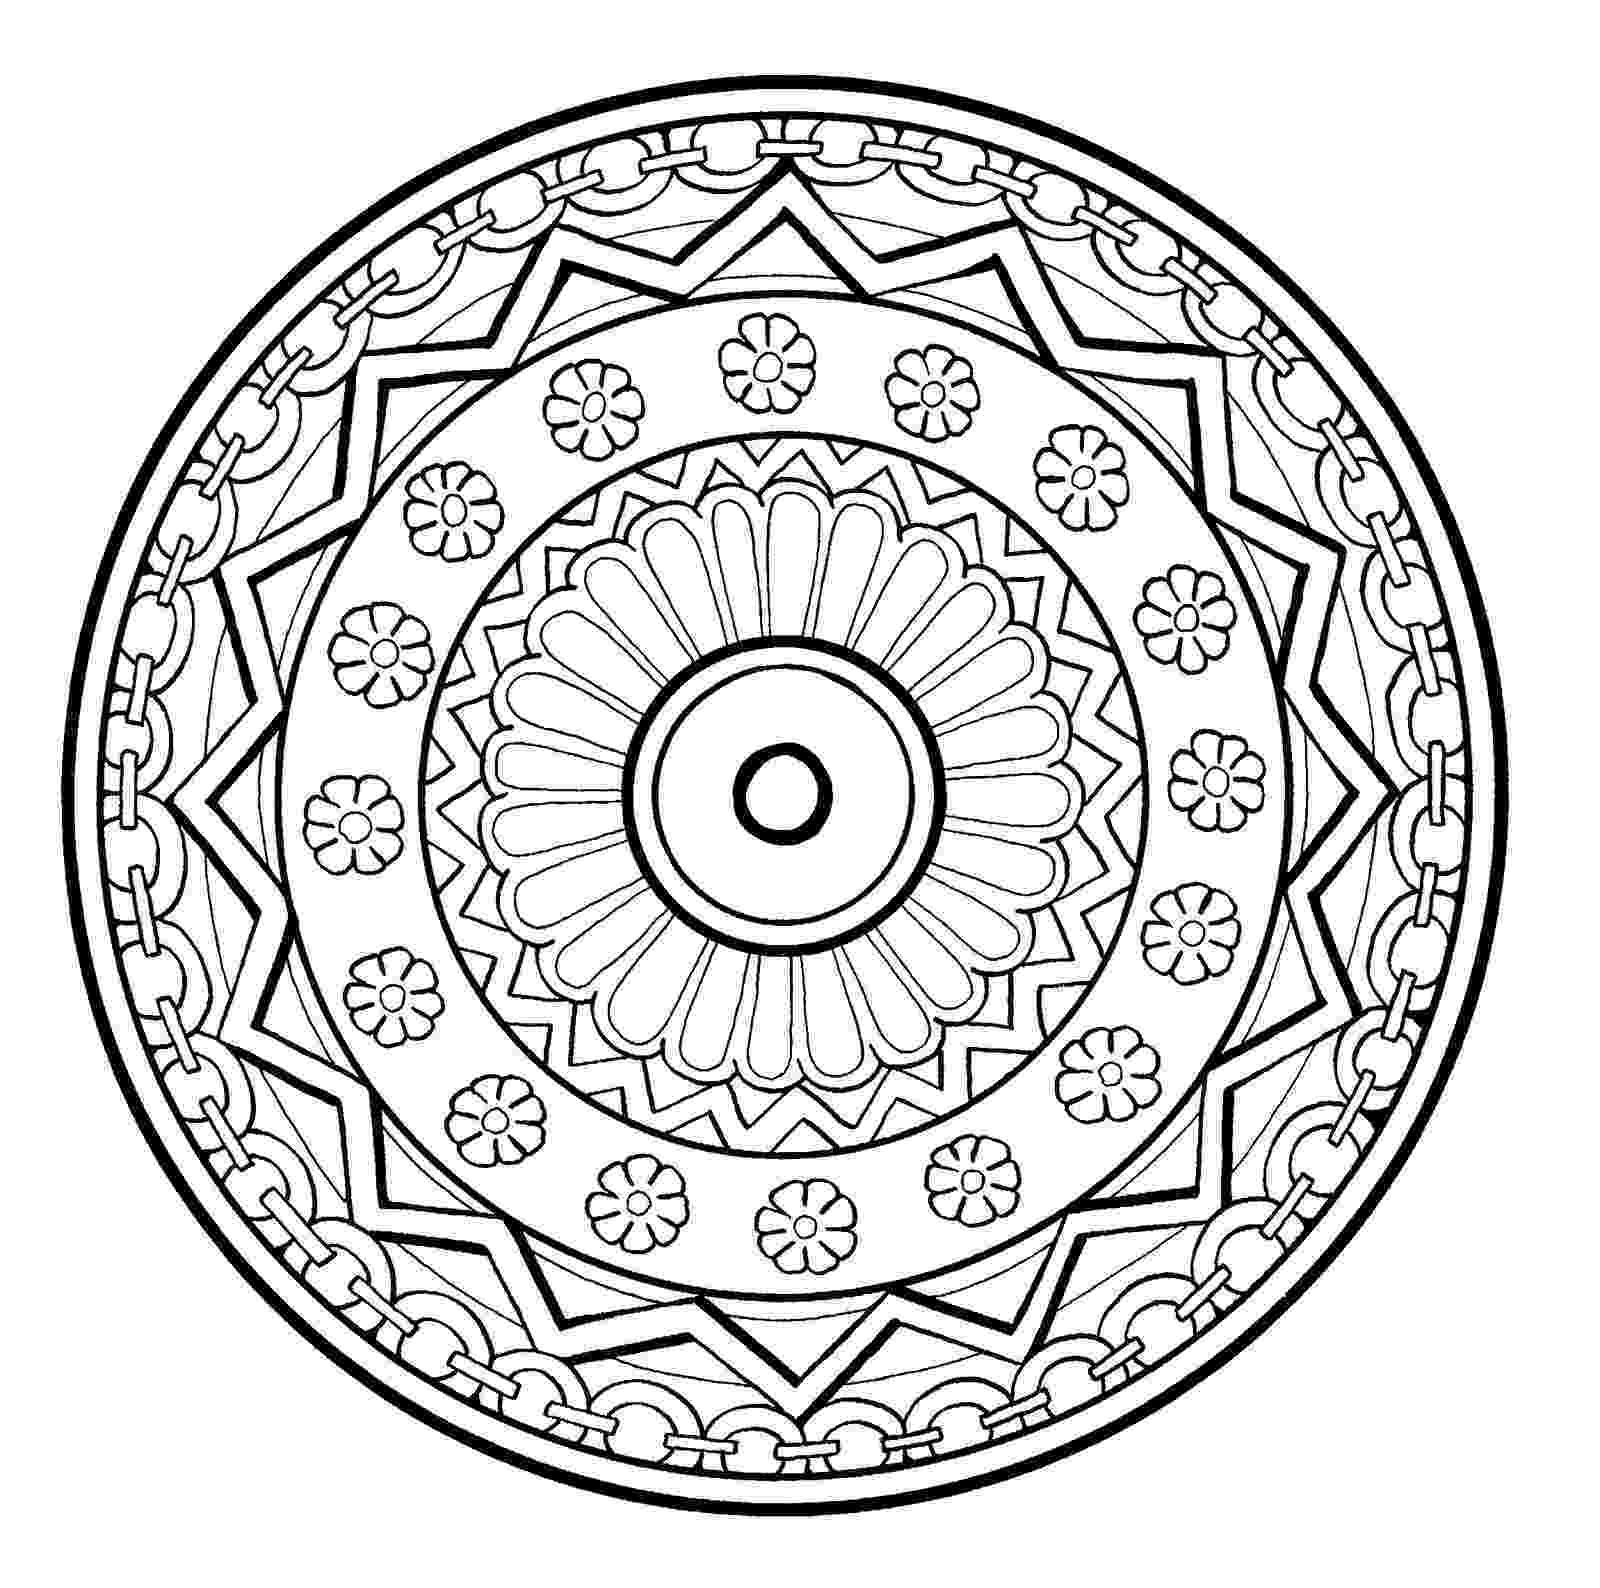 mandala to color celtic mandala coloring page free printable coloring pages color mandala to